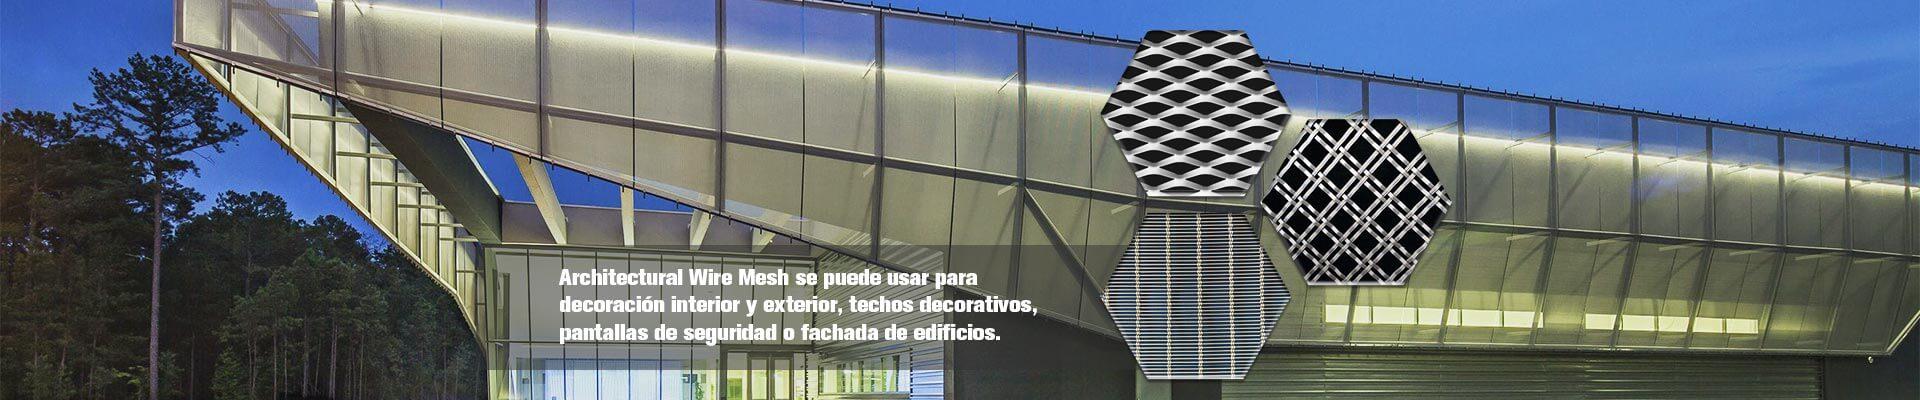 Malla arquitectónica